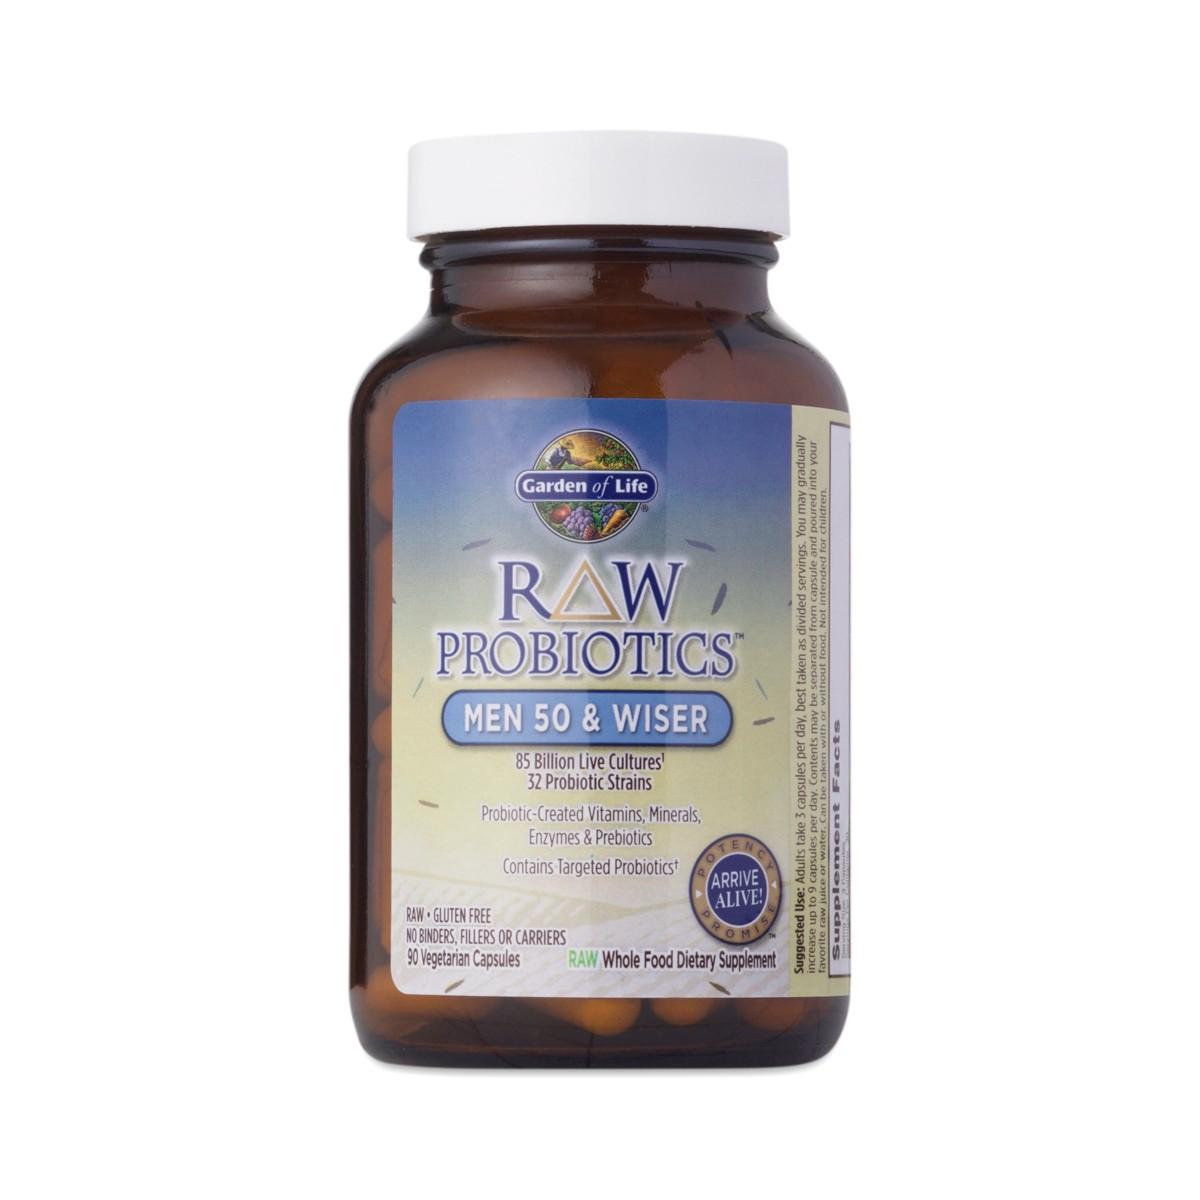 Garden of life raw probiotics men thrive market for Garden of life probiotics review